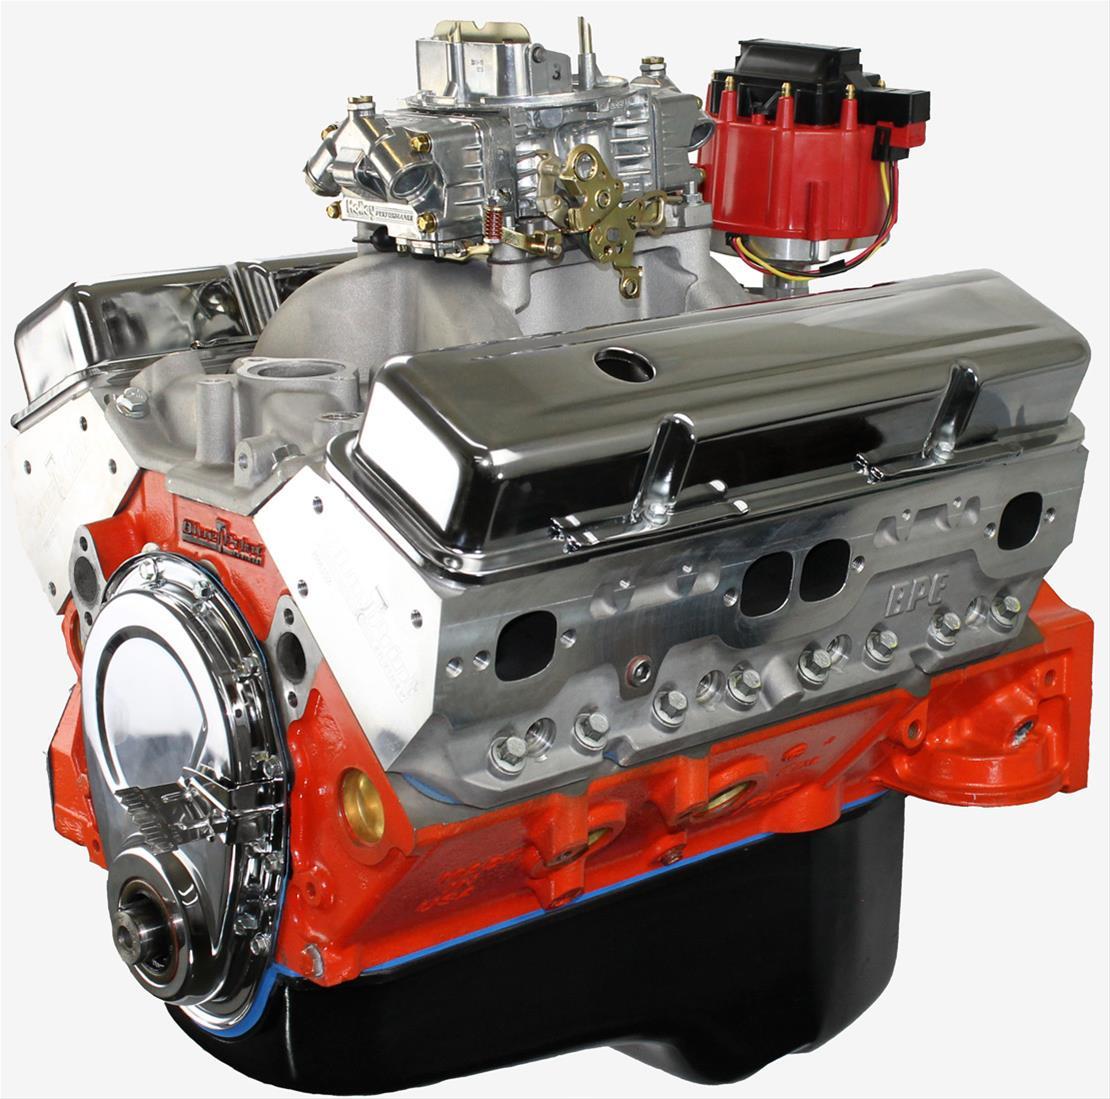 BluePrint Engines GM 400 C I D  460 HP Dressed Long Block Crate Engines  BP4001CTC1